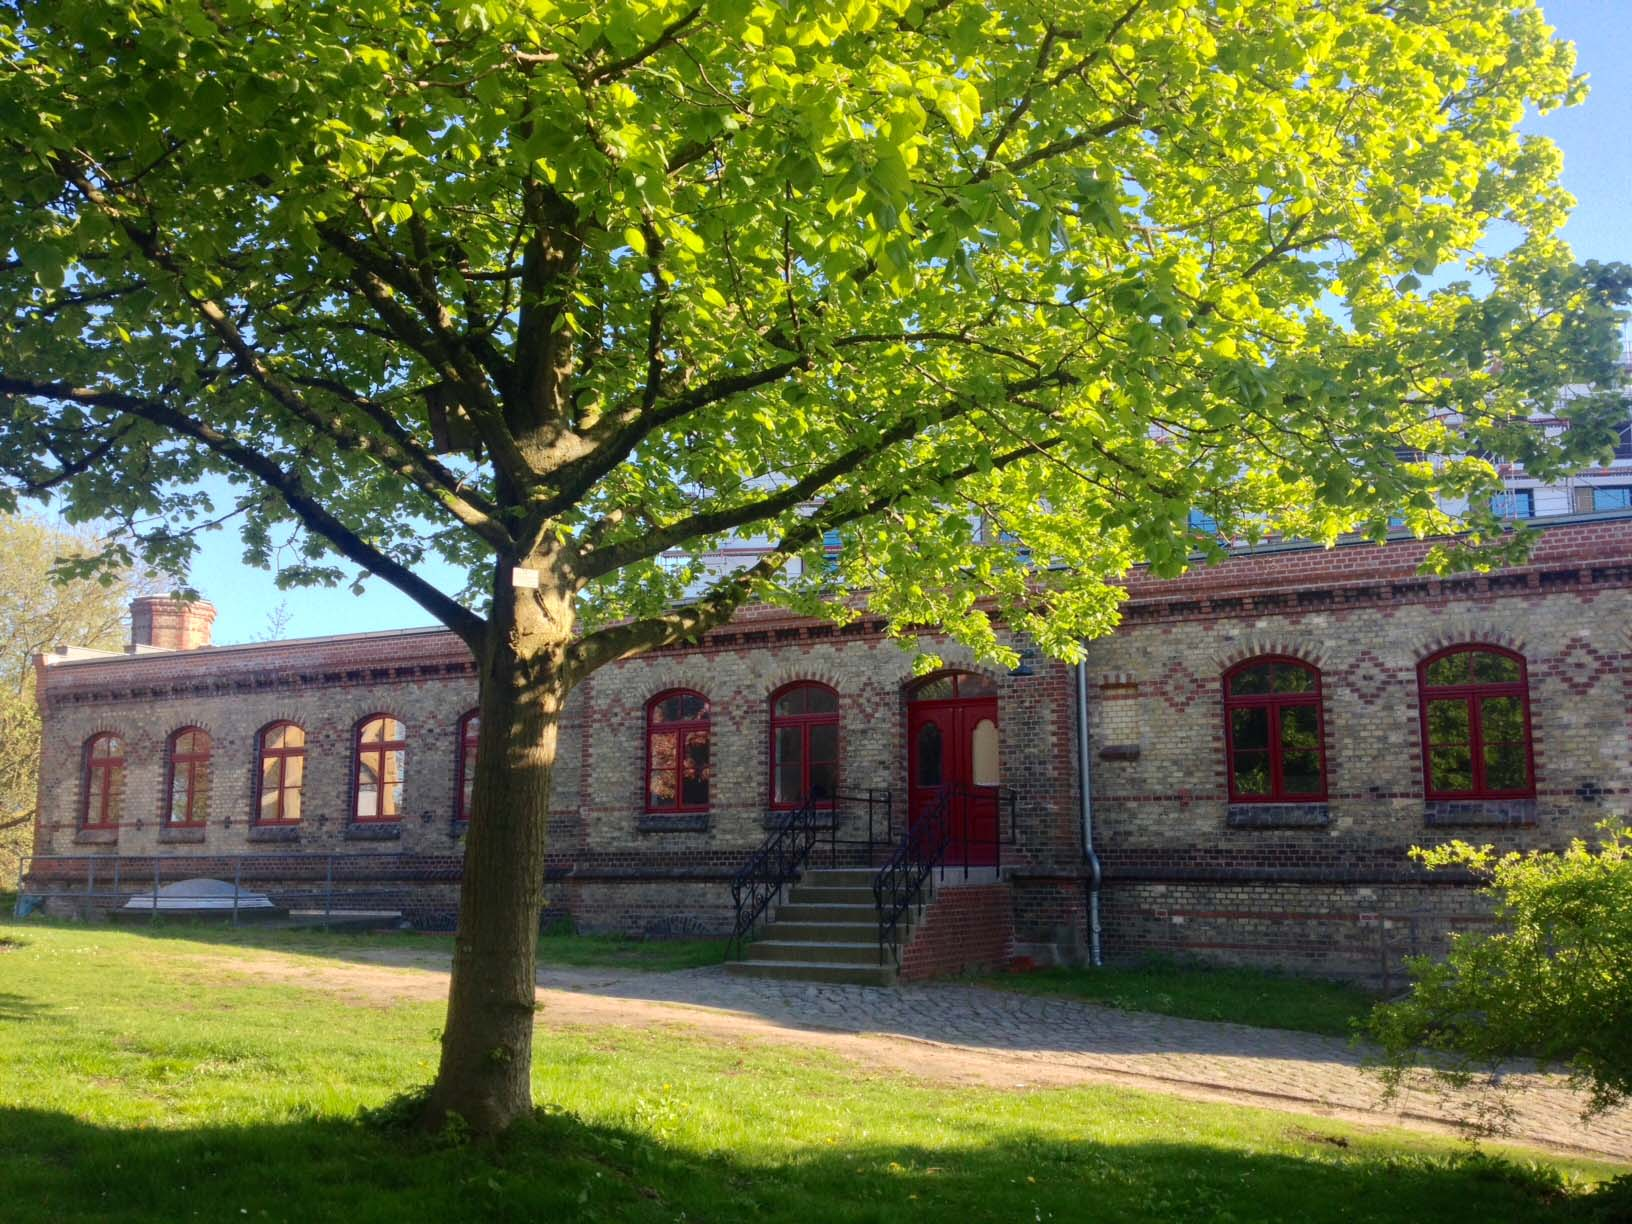 Alter Botanischer Garten Kiel: Alter Botanischer Garten Kiel Aktuelles